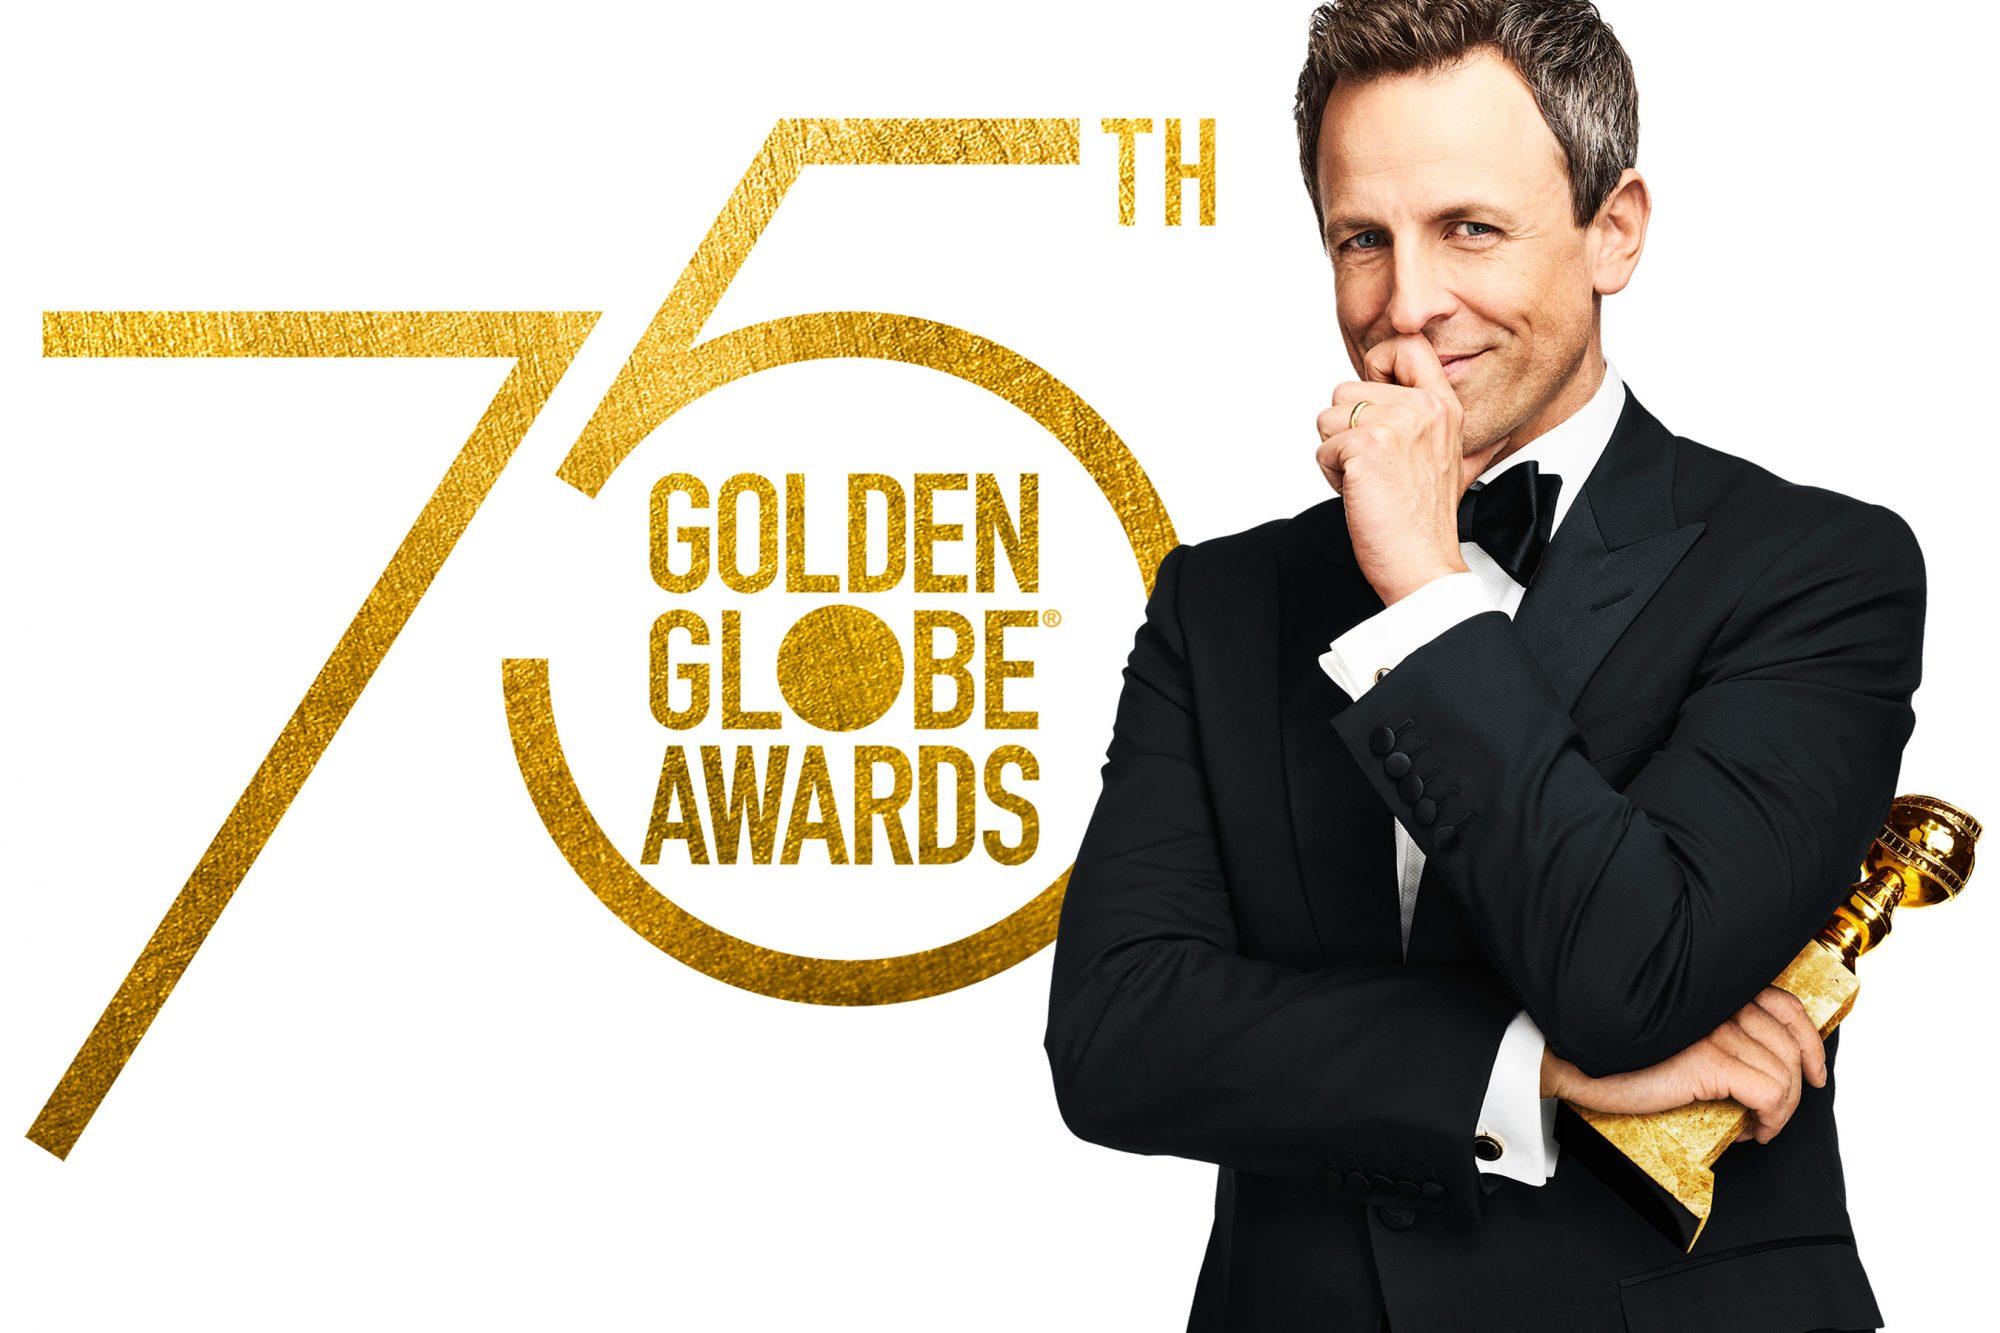 Golden Globe Awards (75th Annual) - Season 75